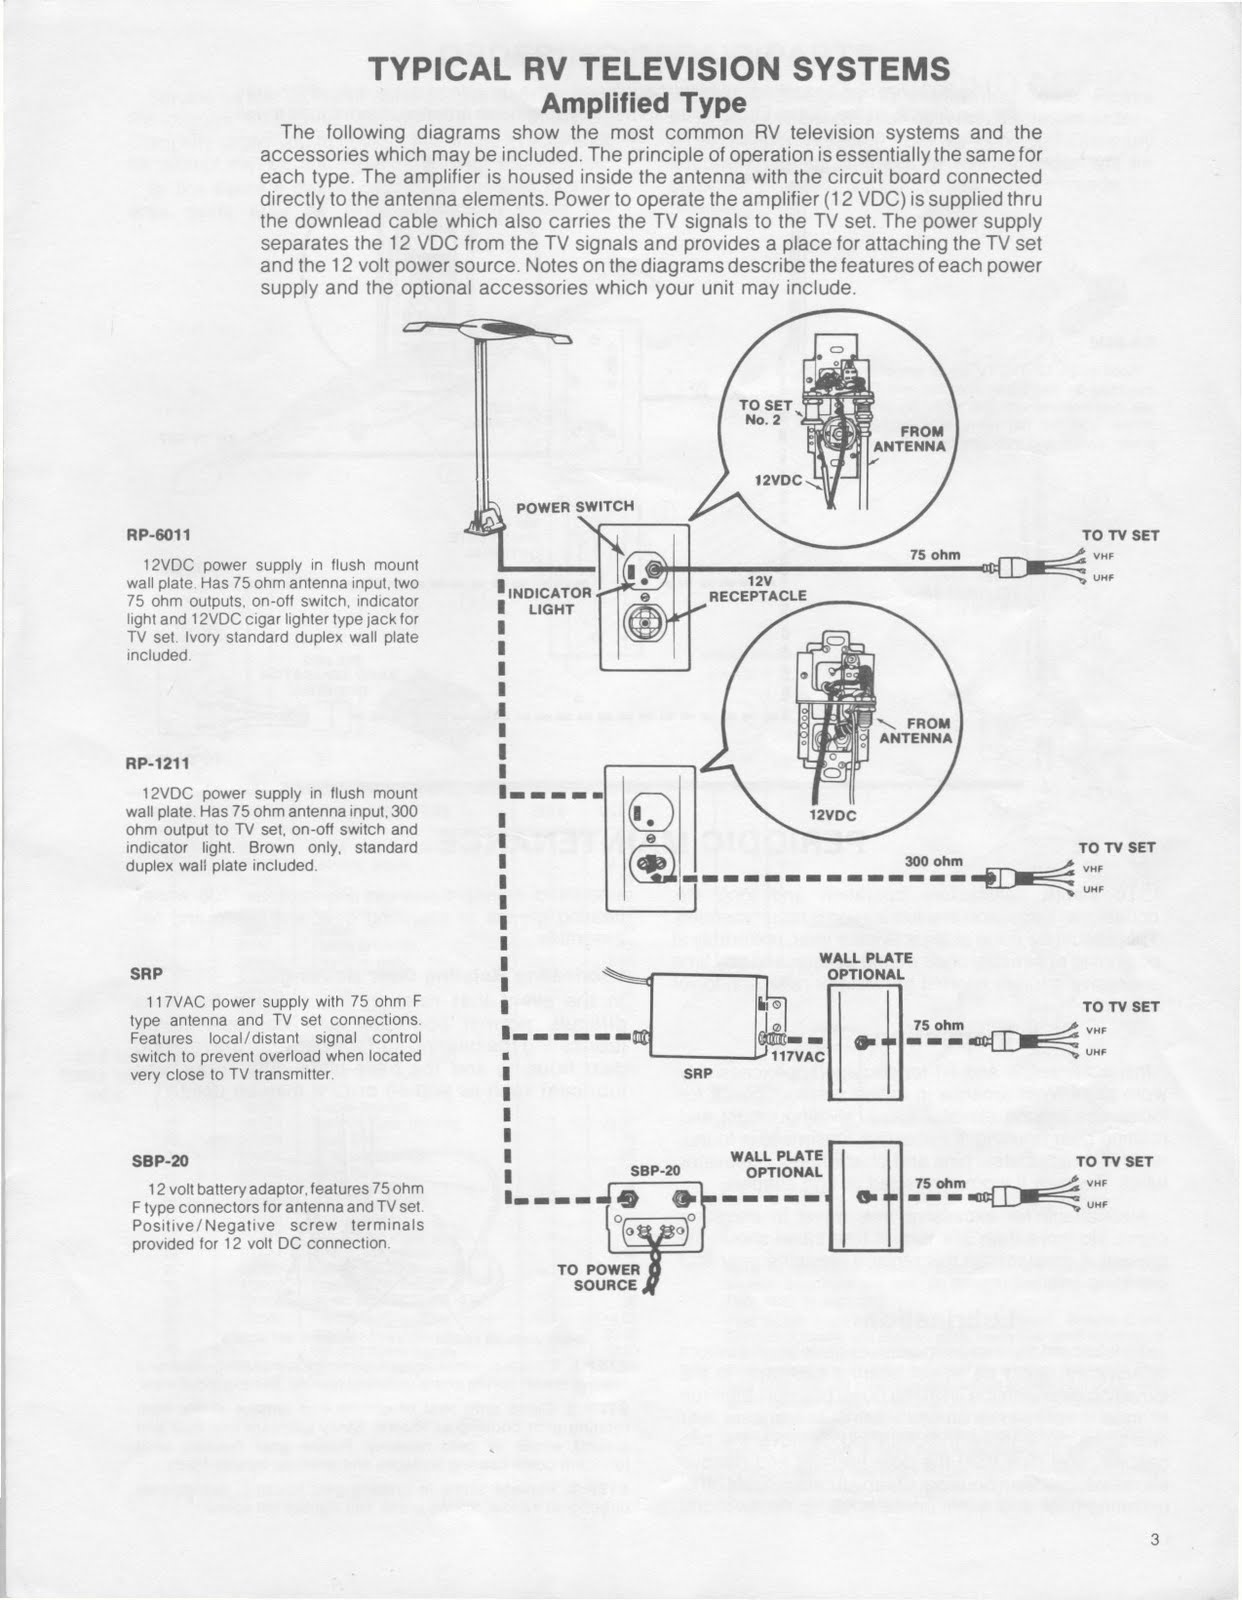 Wiring Diagram Winnebago The Wiring Diagram readingratnet